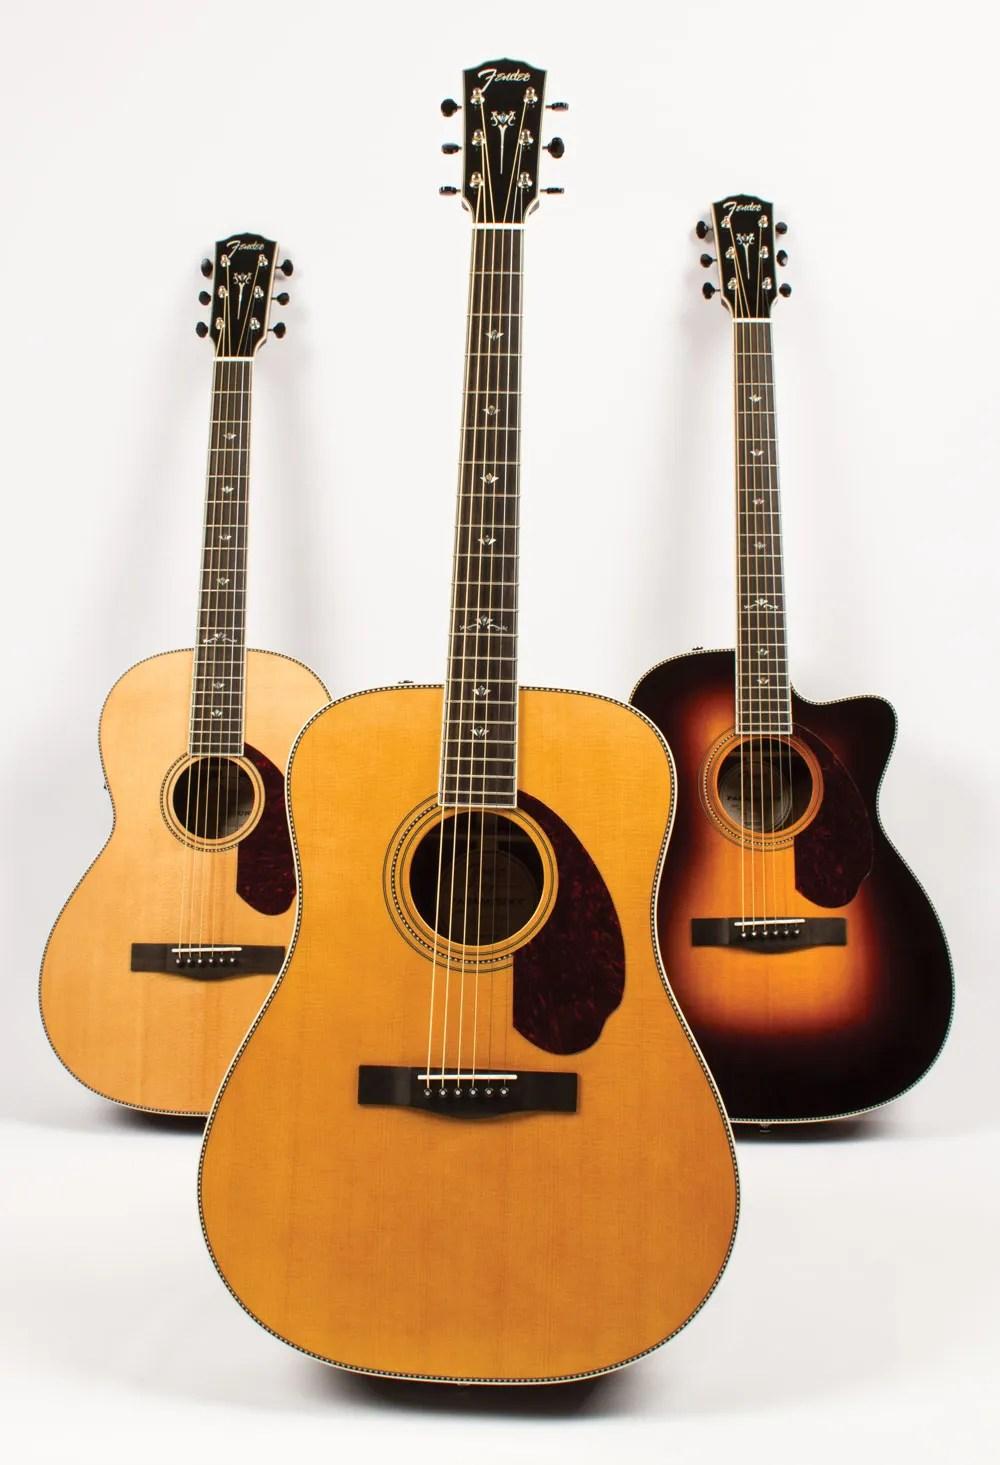 Yamaha Solid Wood Acoustic